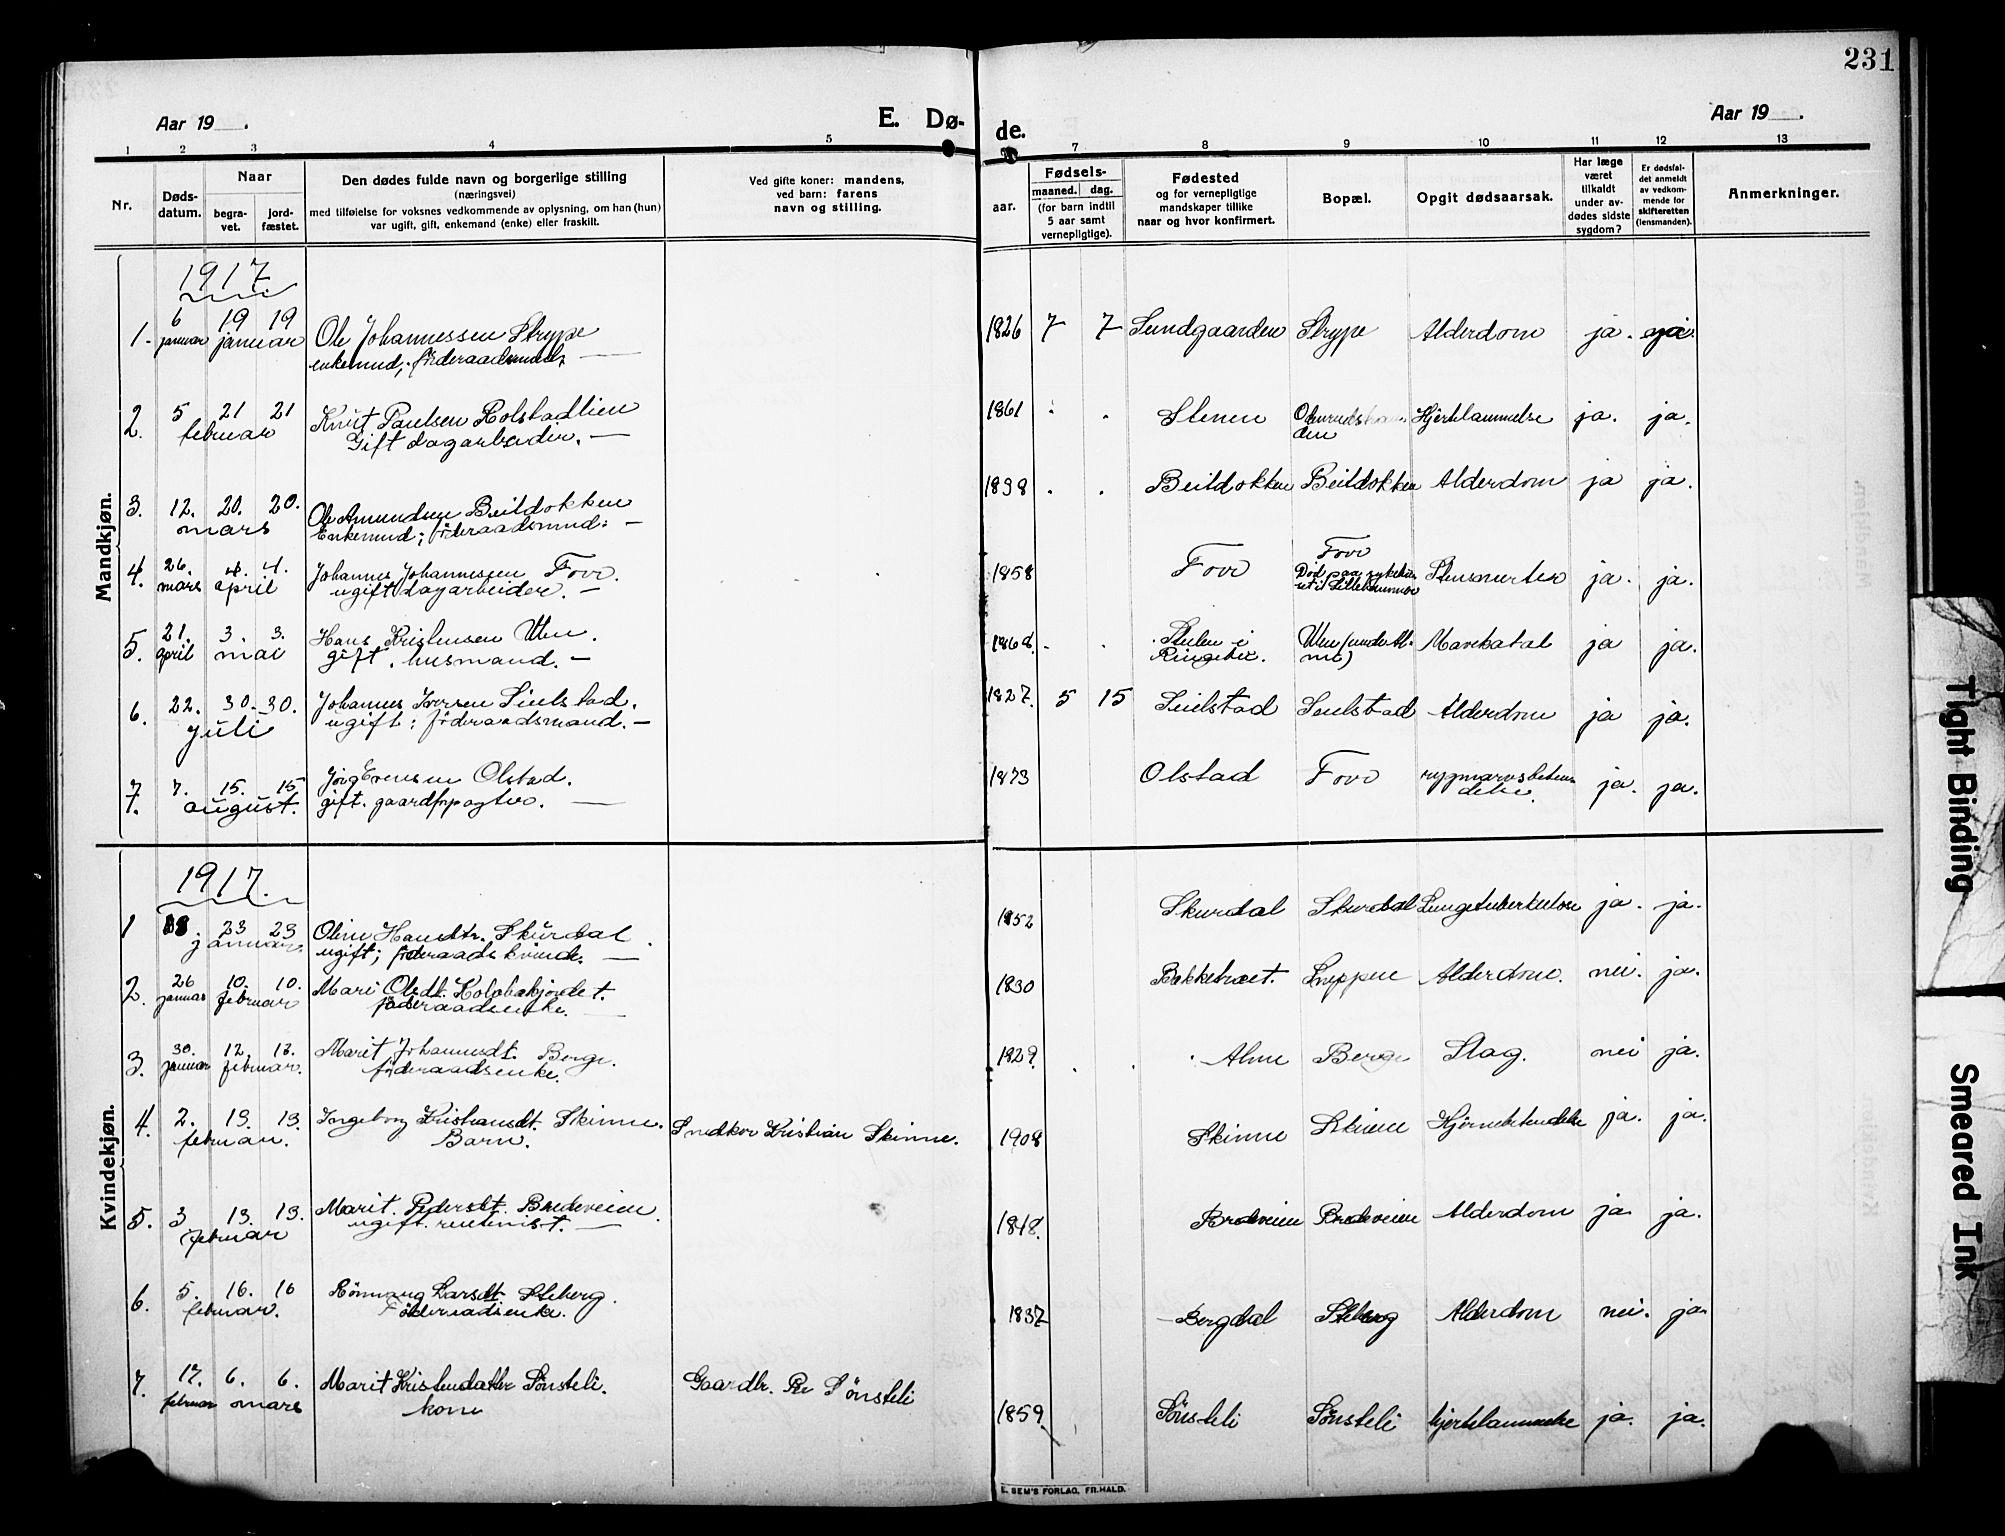 SAH, Sør-Fron prestekontor, H/Ha/Hab/L0005: Klokkerbok nr. 5, 1912-1930, s. 231